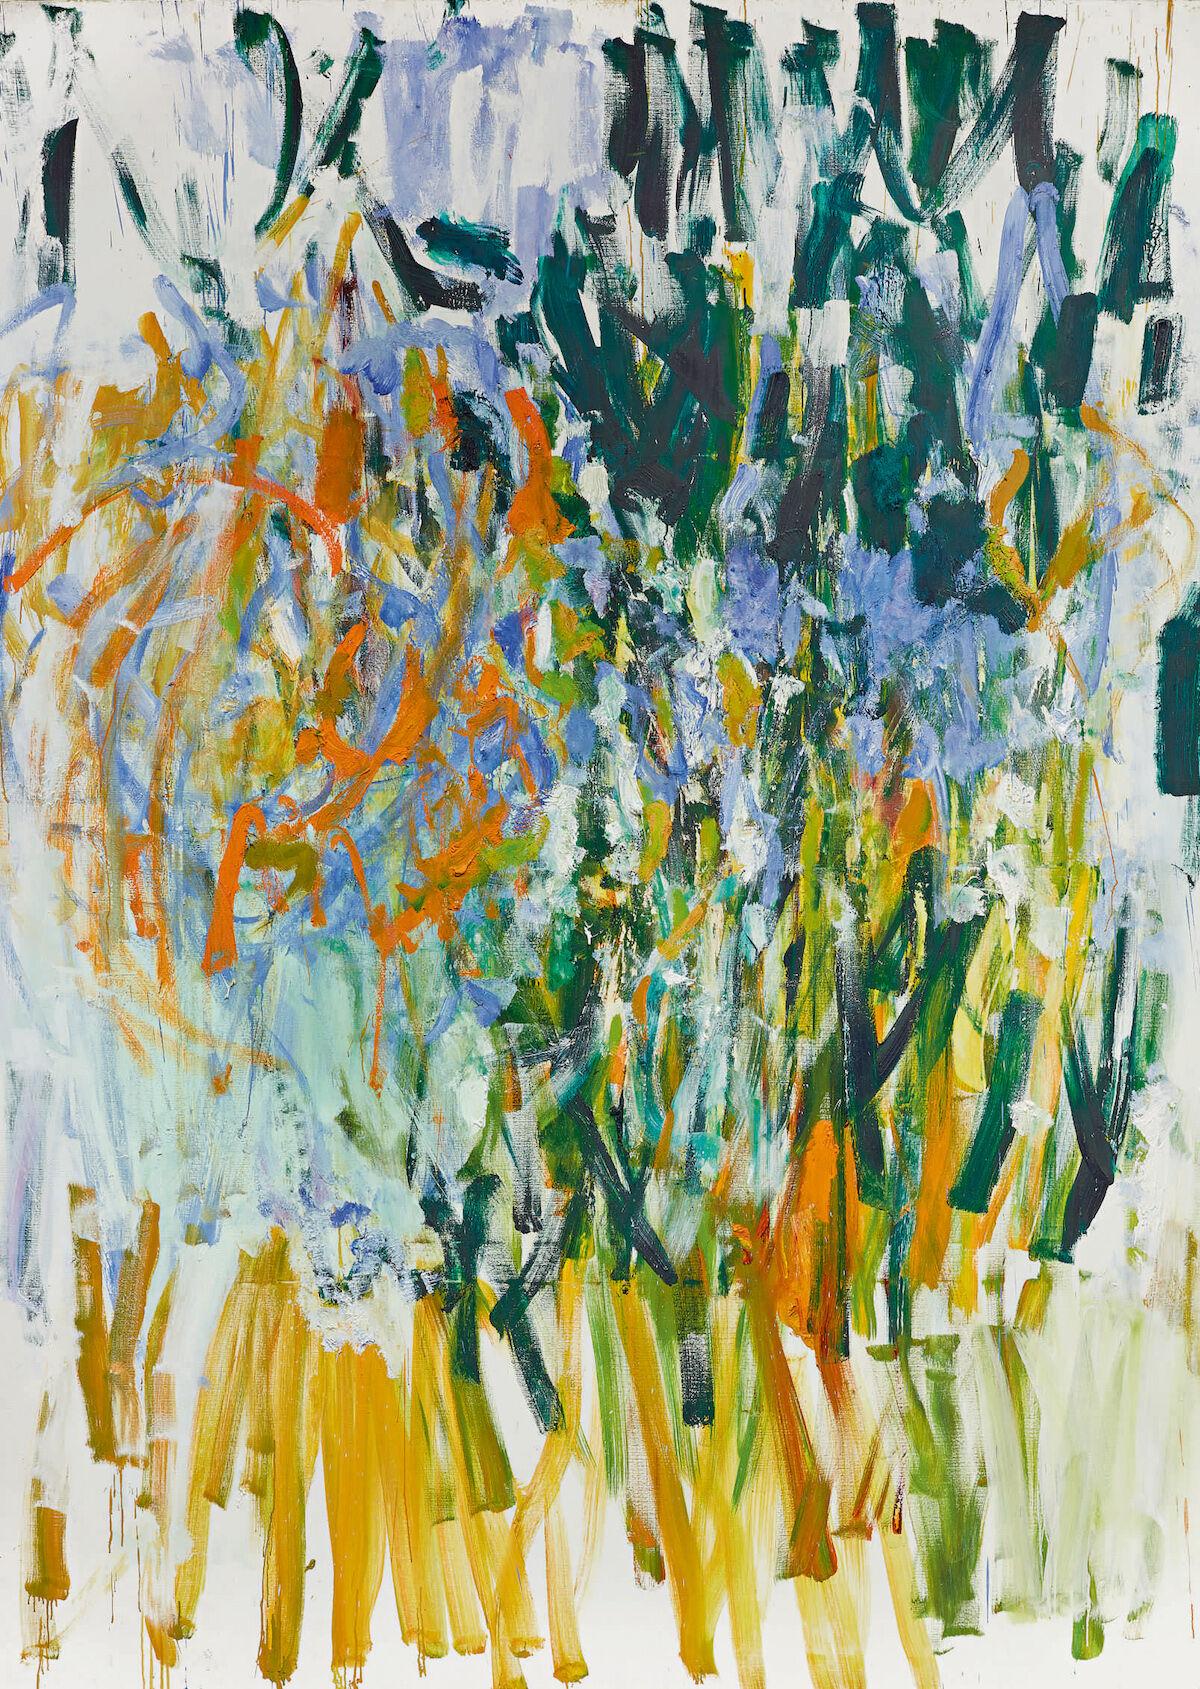 Joan Mitchell, Straw, 1976. Est. $5 million–$7 million. Courtesy Sotheby's.